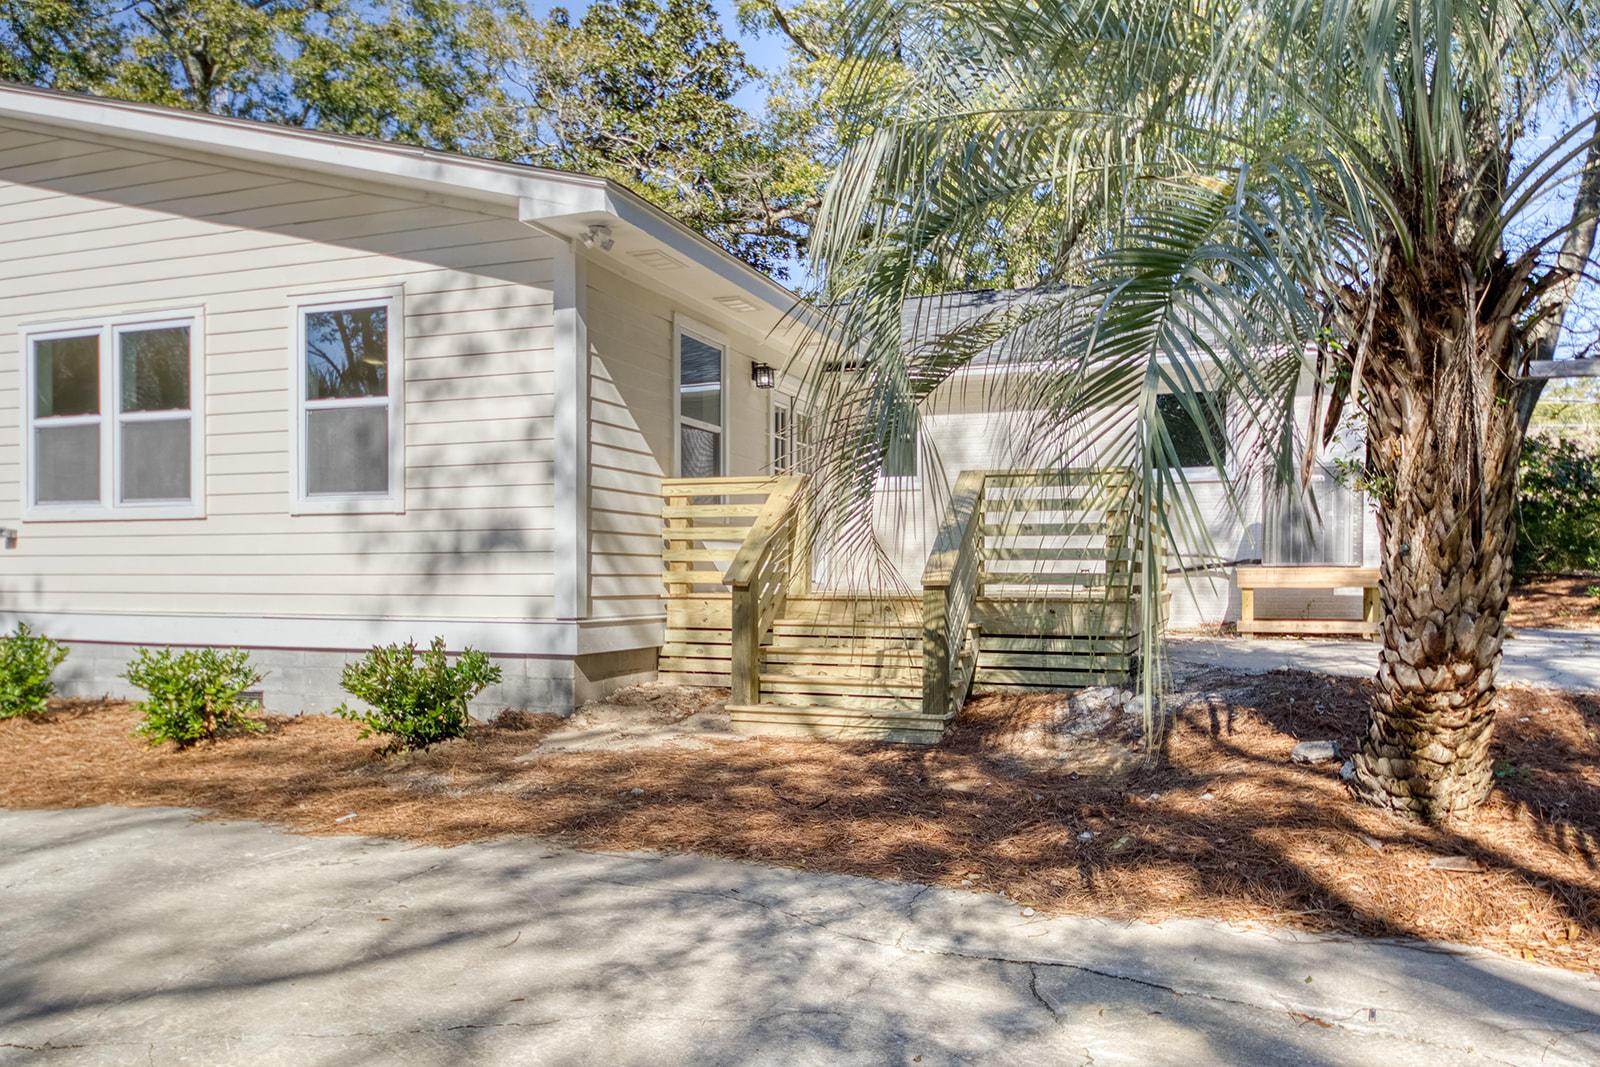 Bay View Acres Homes For Sale - 265 Coleman, Mount Pleasant, SC - 23